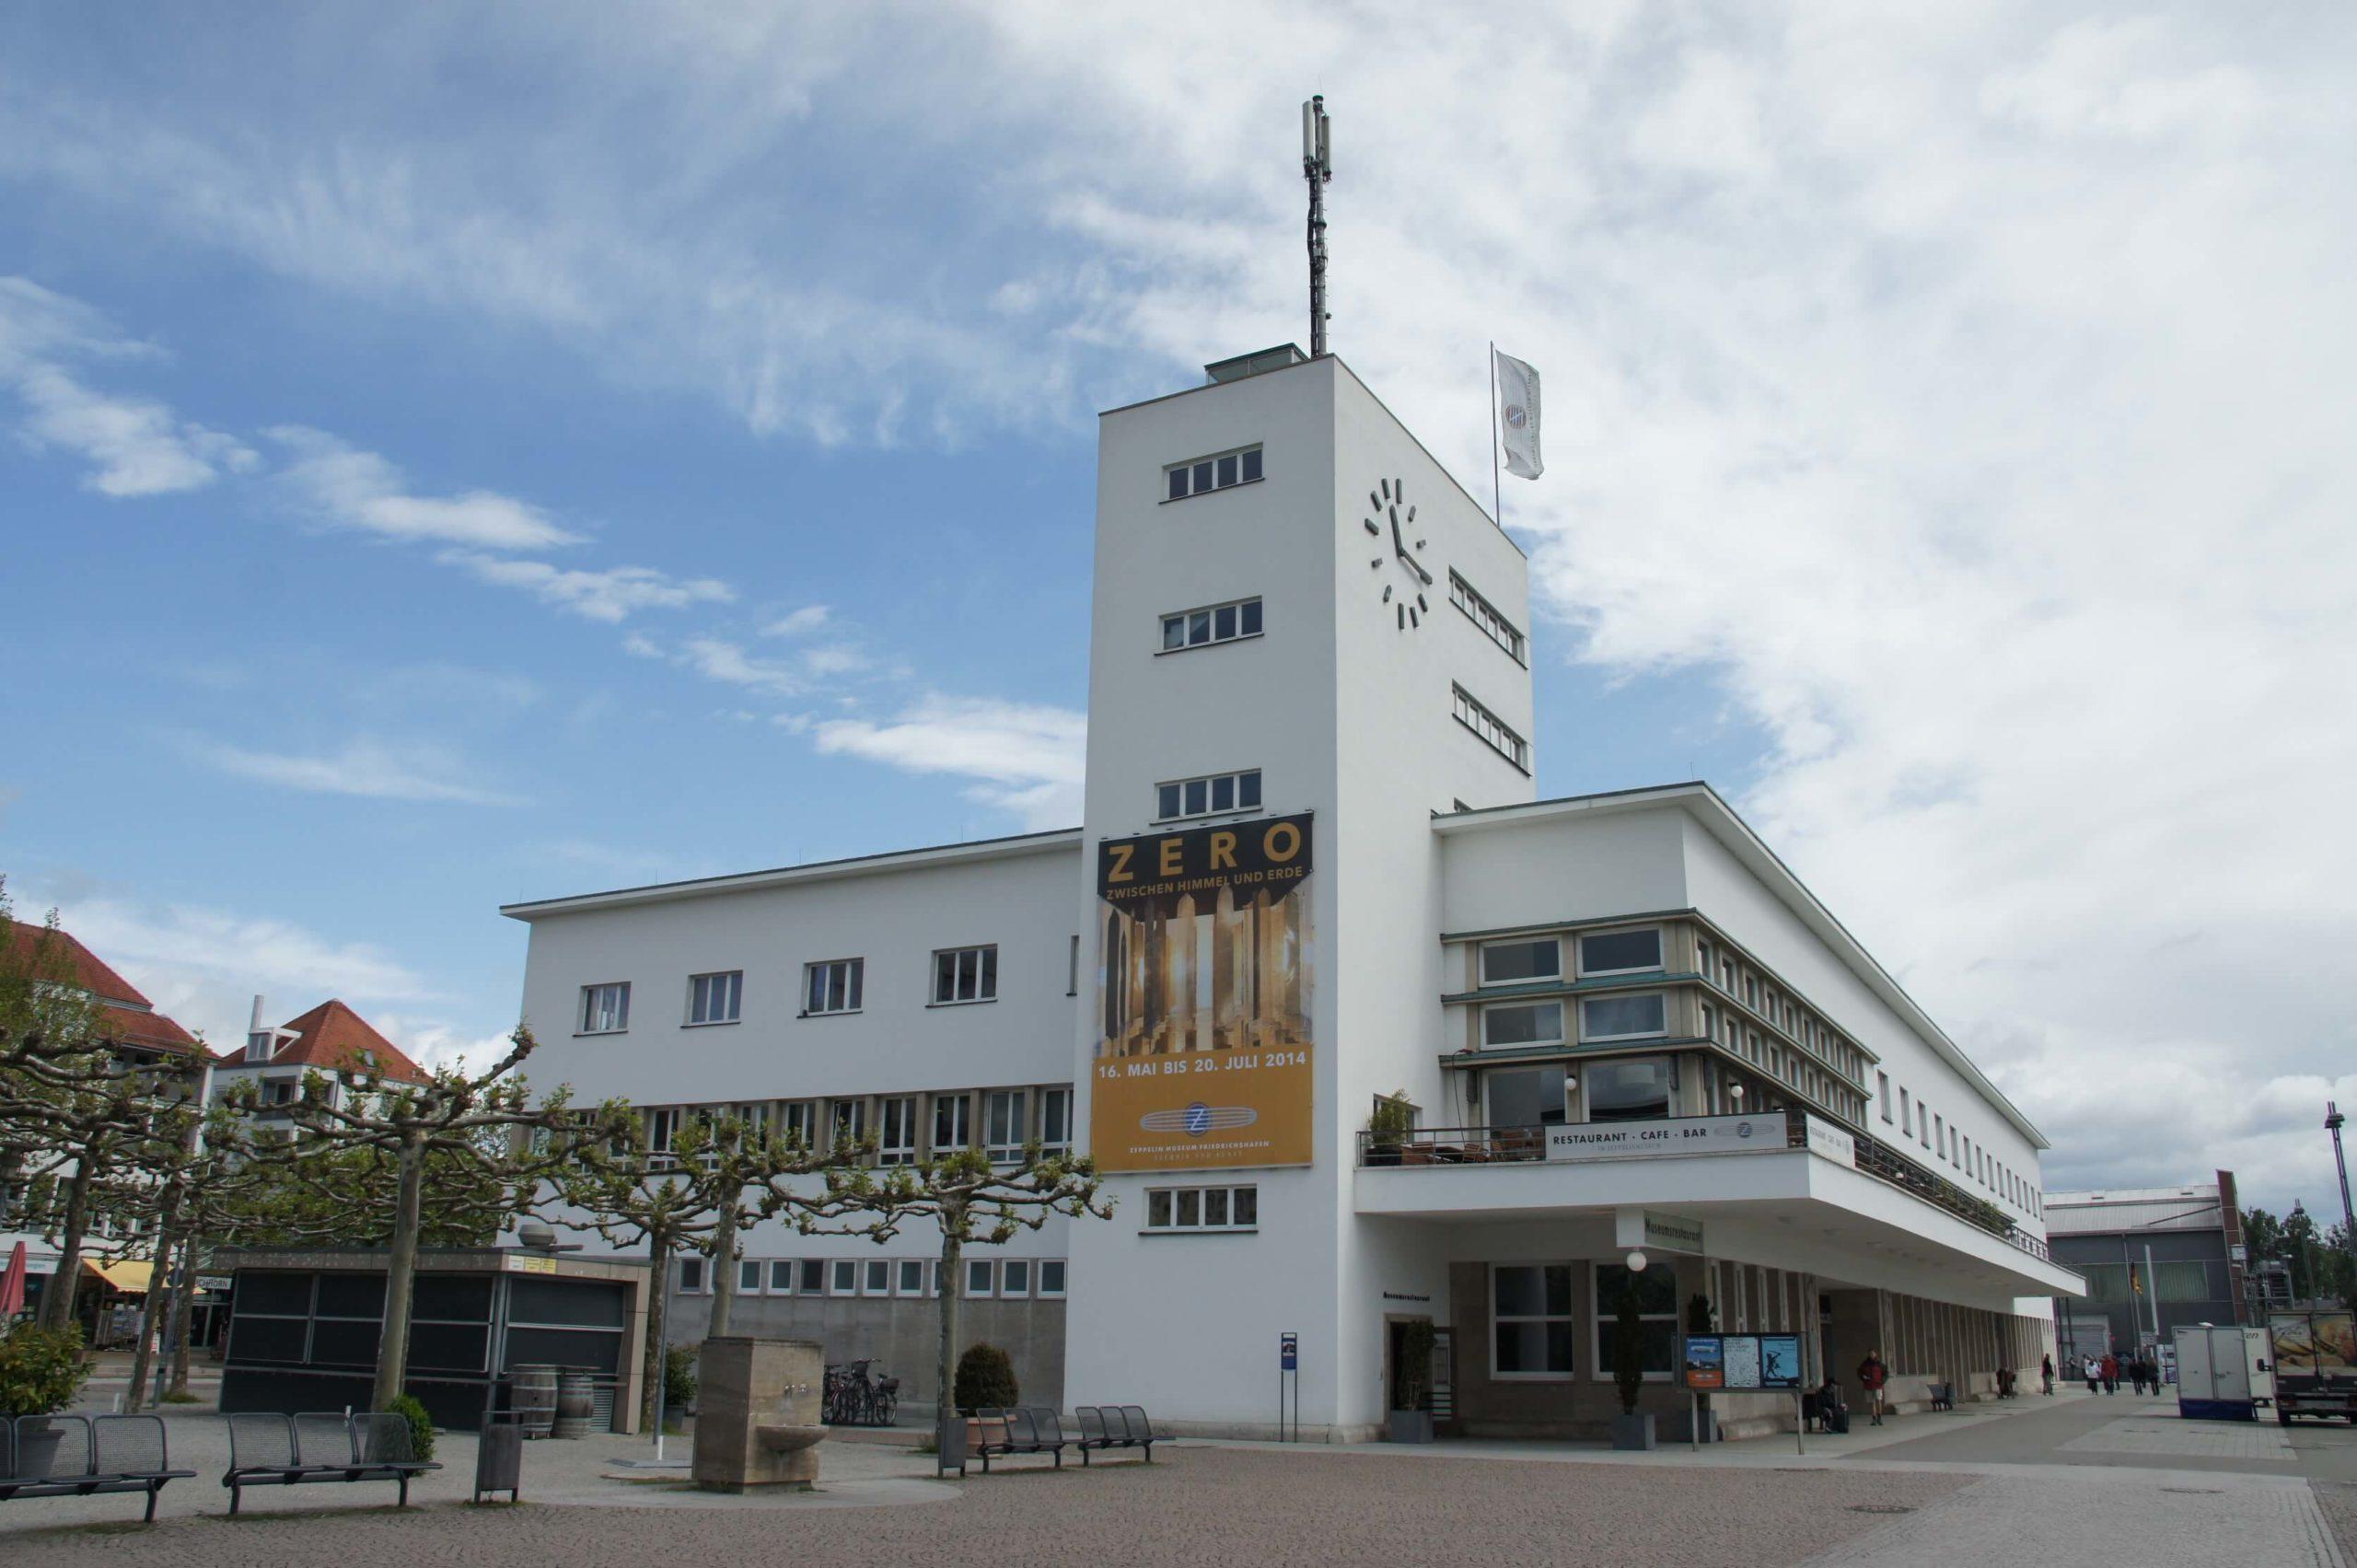 Friedrichshafen – Germany